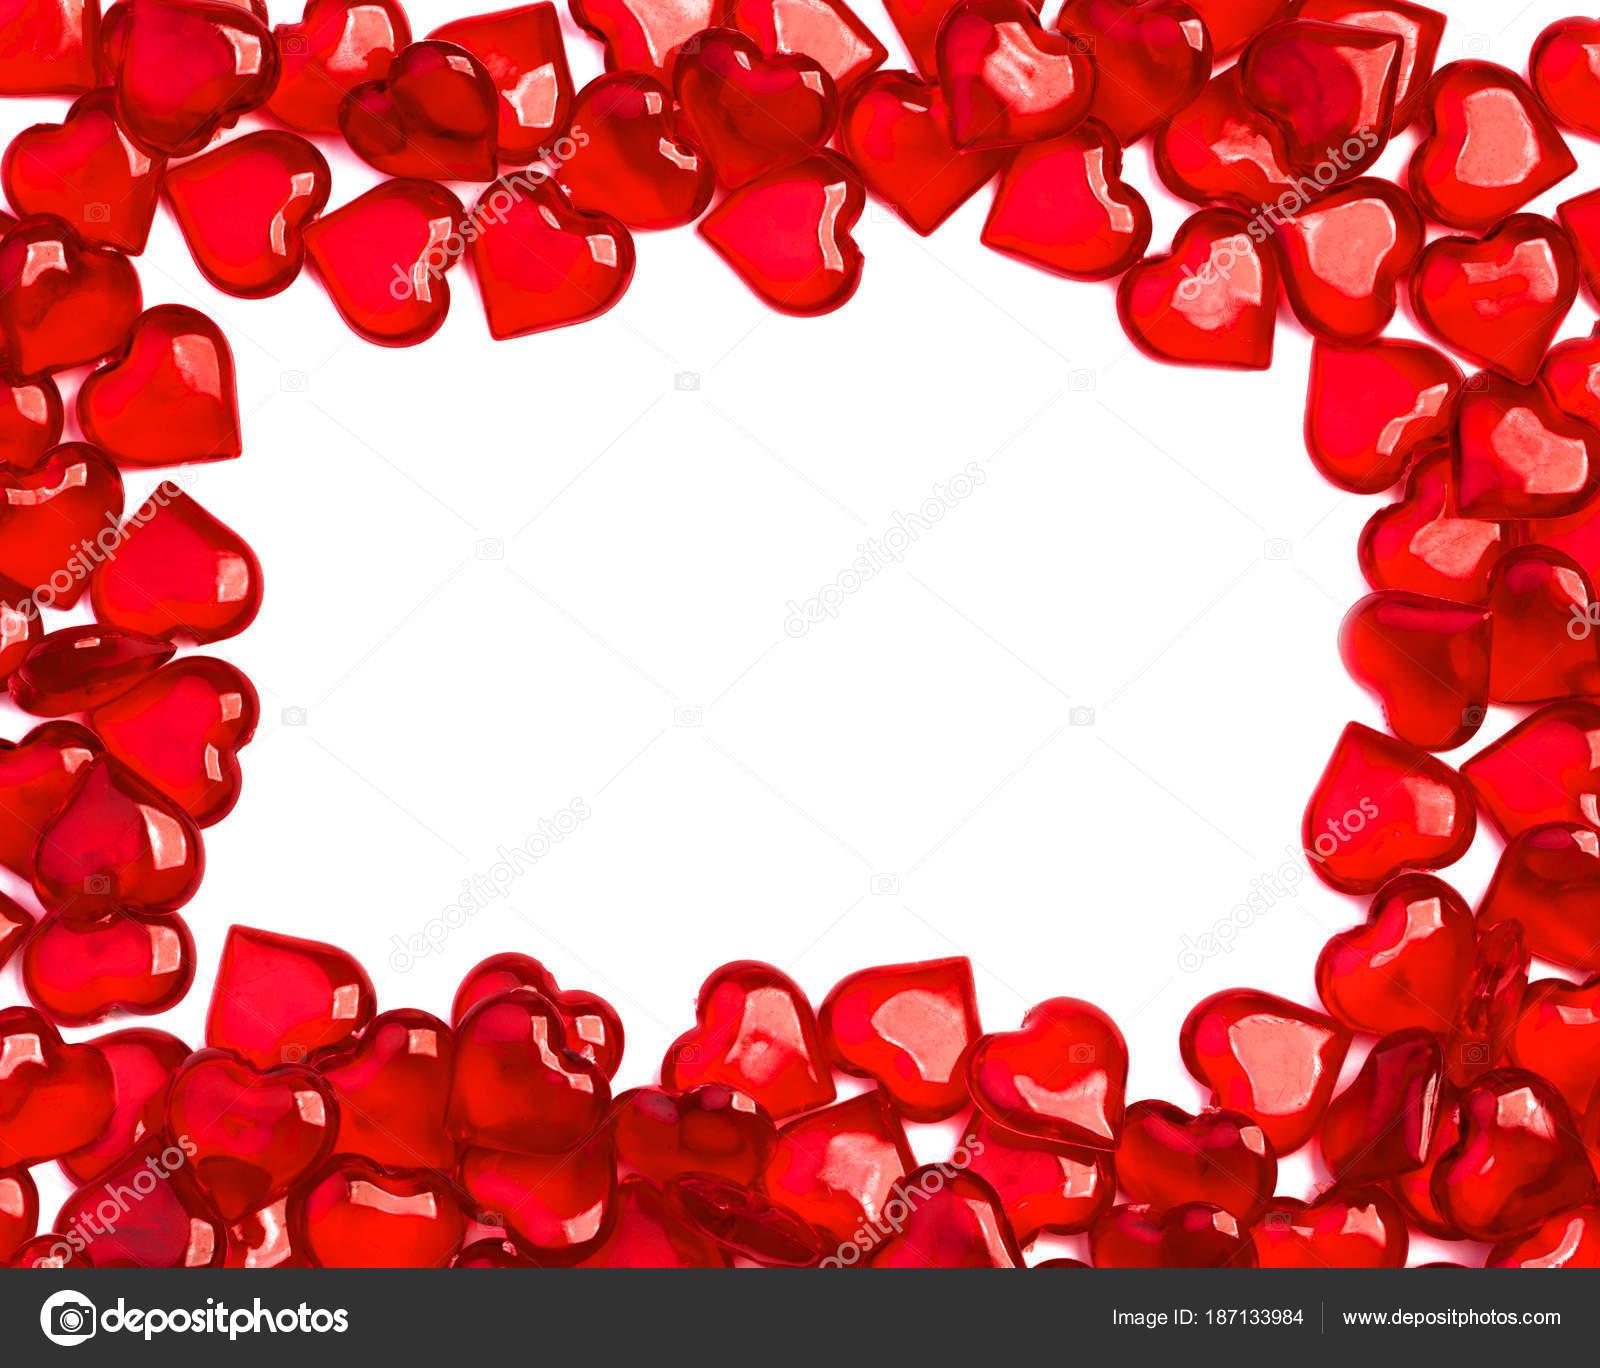 marco de cristal corazón — Foto de stock © lesuhova #187133984